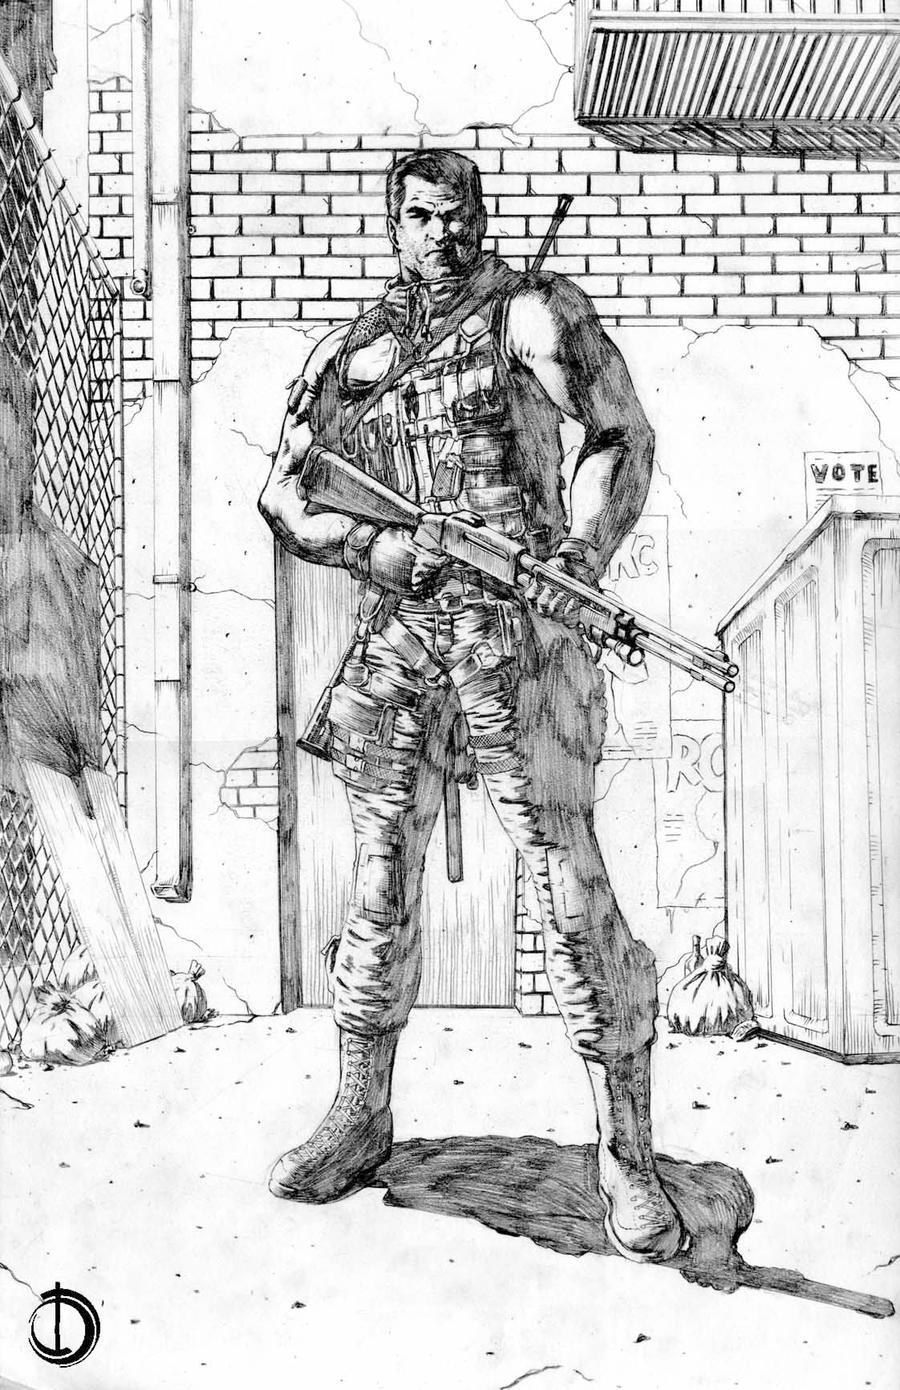 Punisher by santiagocomics